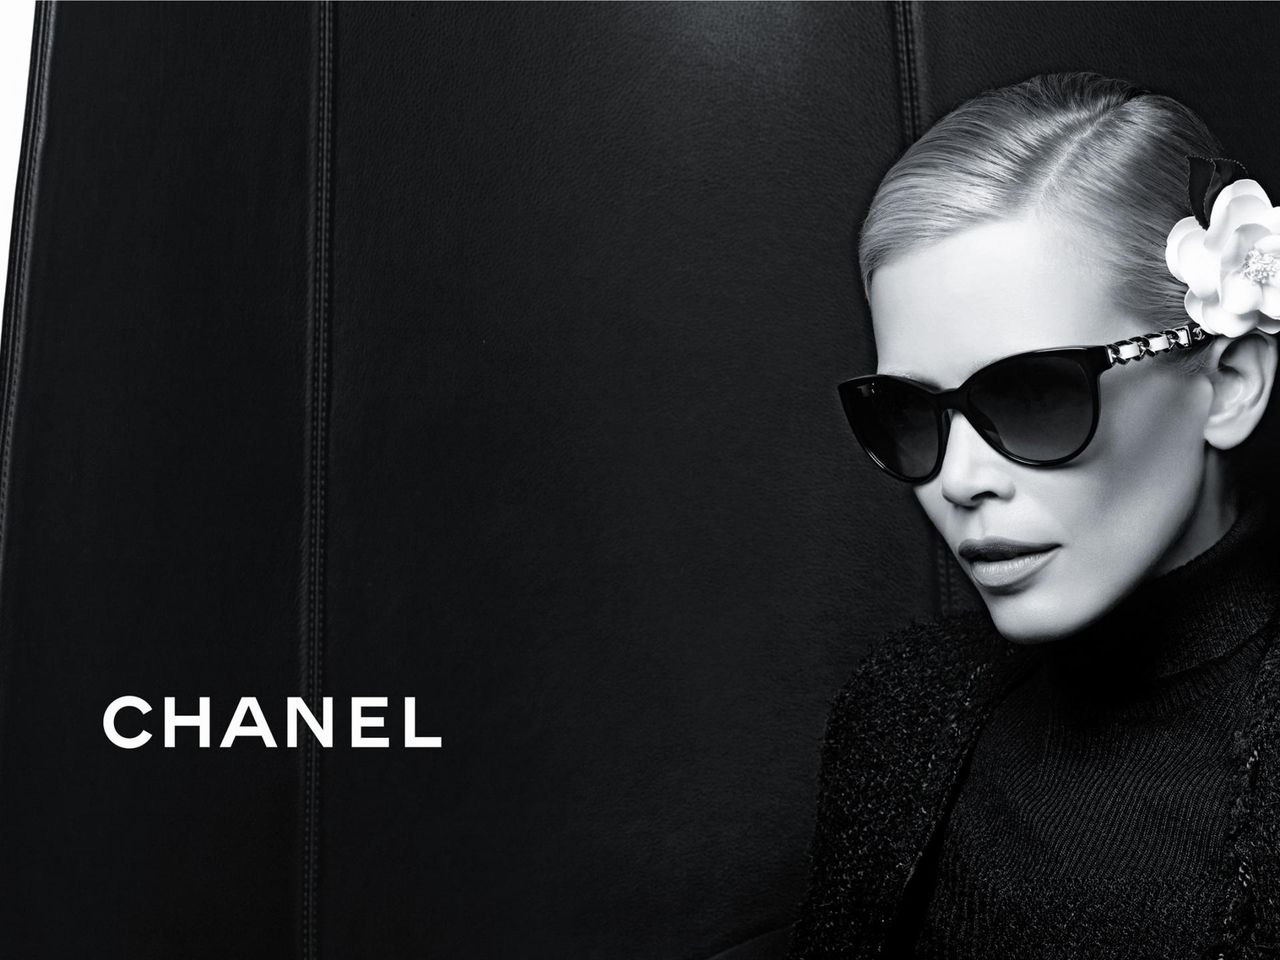 Chanelモノクロ Pc壁紙 壁紙フォルダー